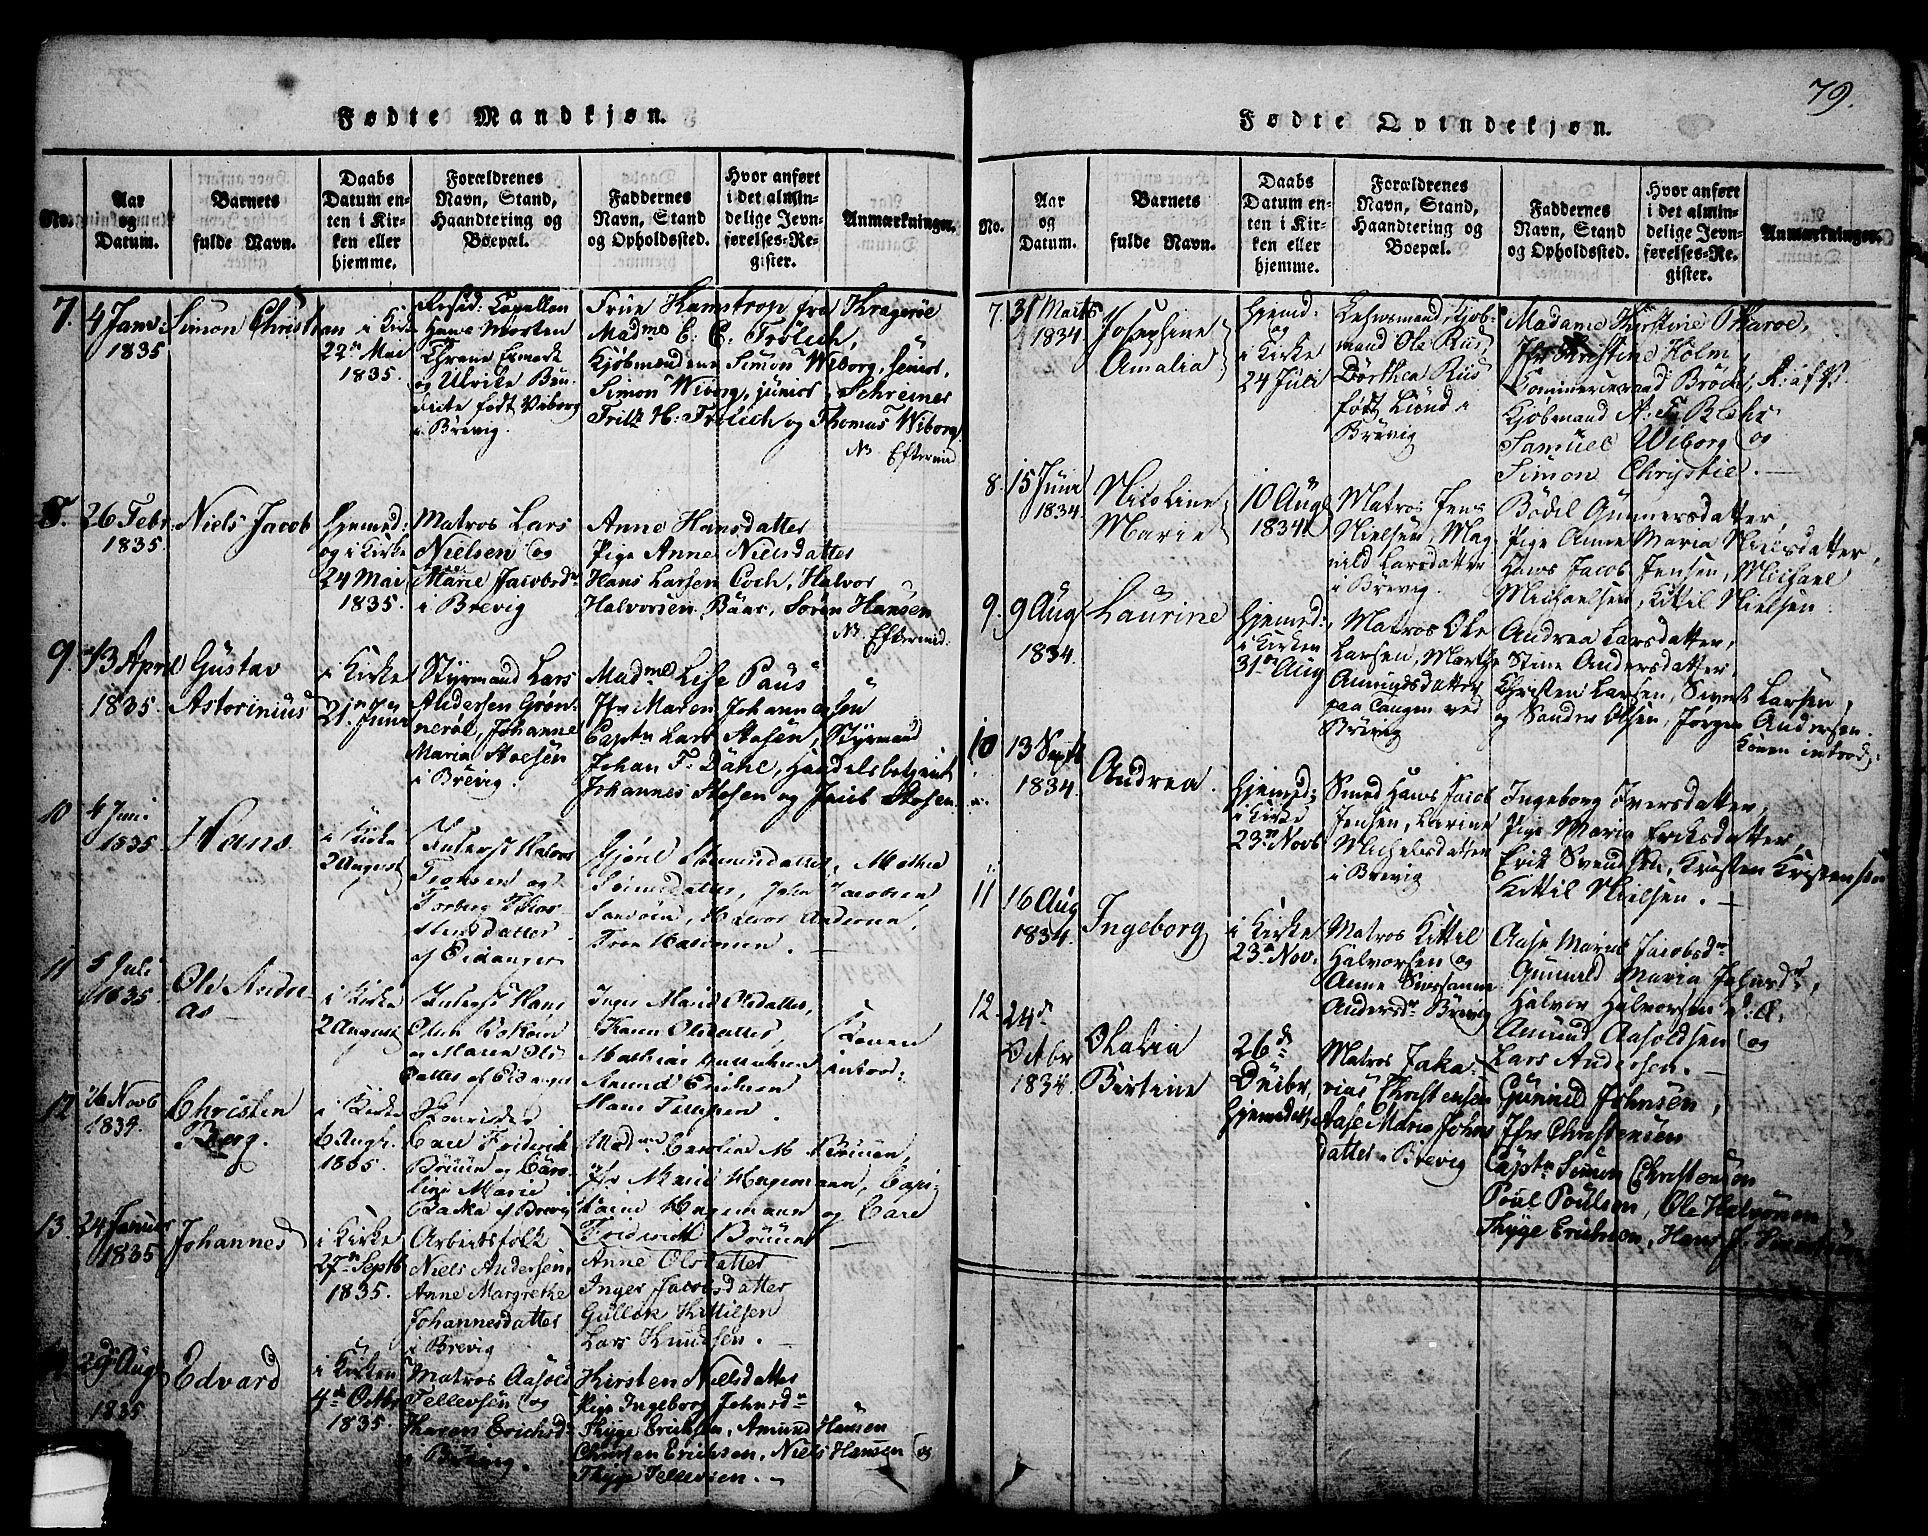 SAKO, Brevik kirkebøker, G/Ga/L0001: Klokkerbok nr. 1, 1814-1845, s. 79